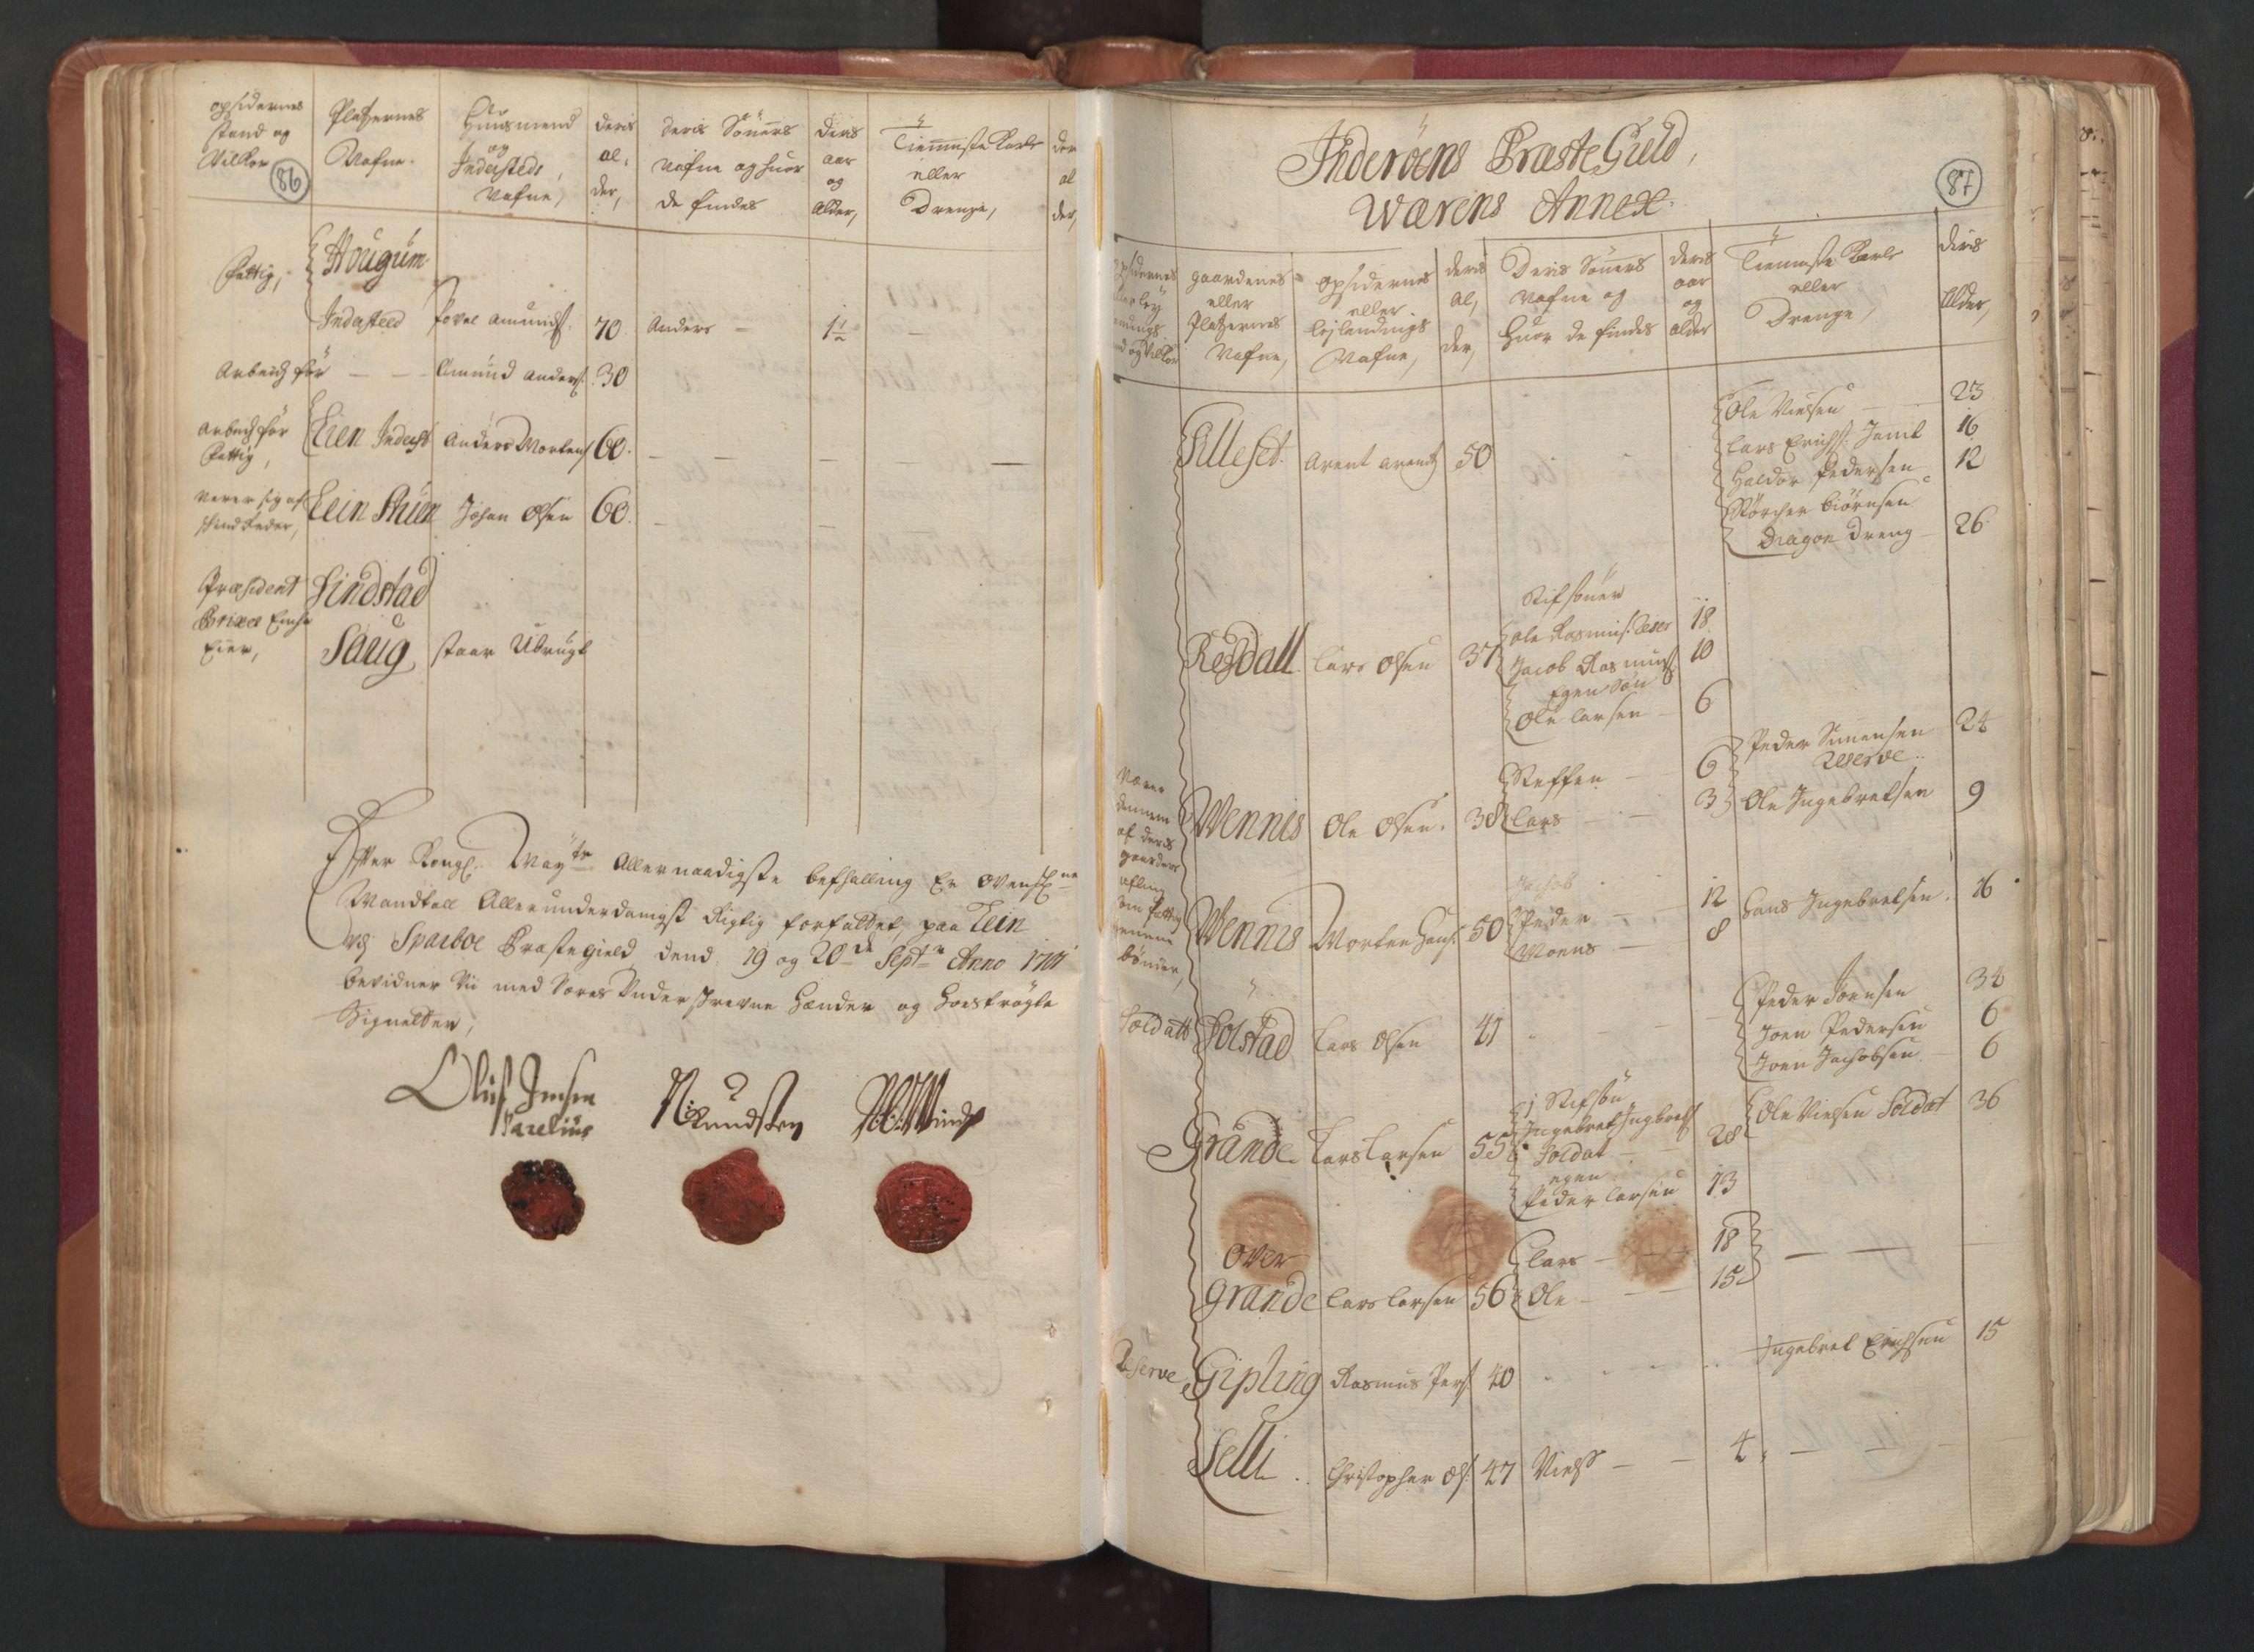 RA, Manntallet 1701, nr. 15: Inderøy fogderi og Namdal fogderi, 1701, s. 86-87